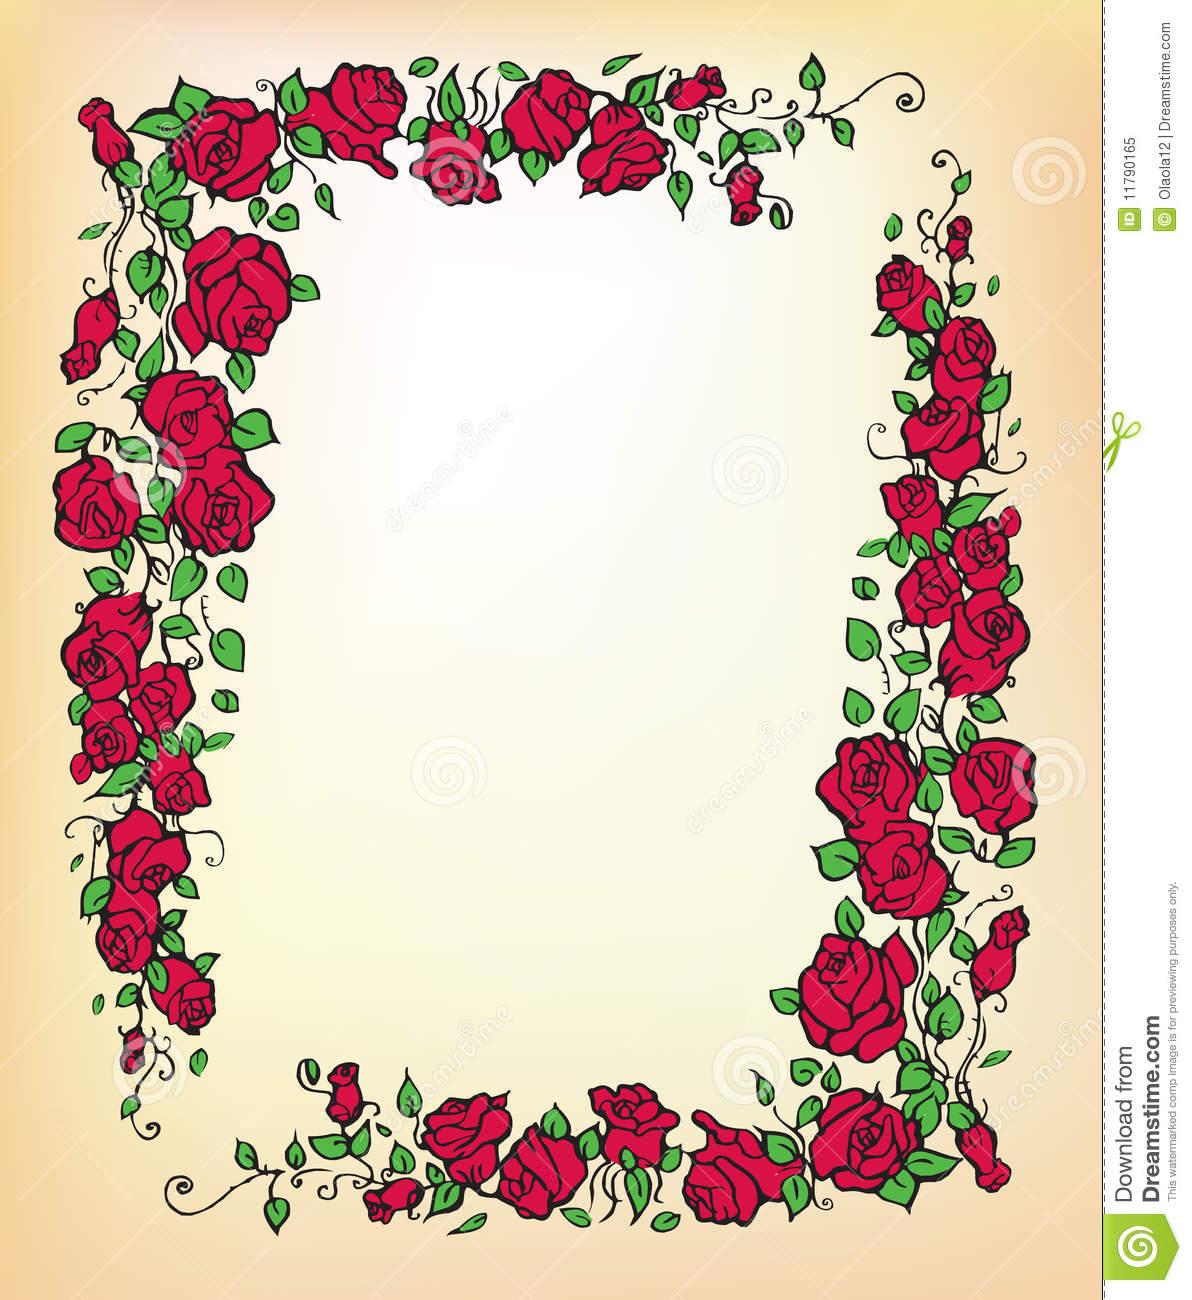 Red Rose Border Clip Art-Red Rose Border Clip Art-12